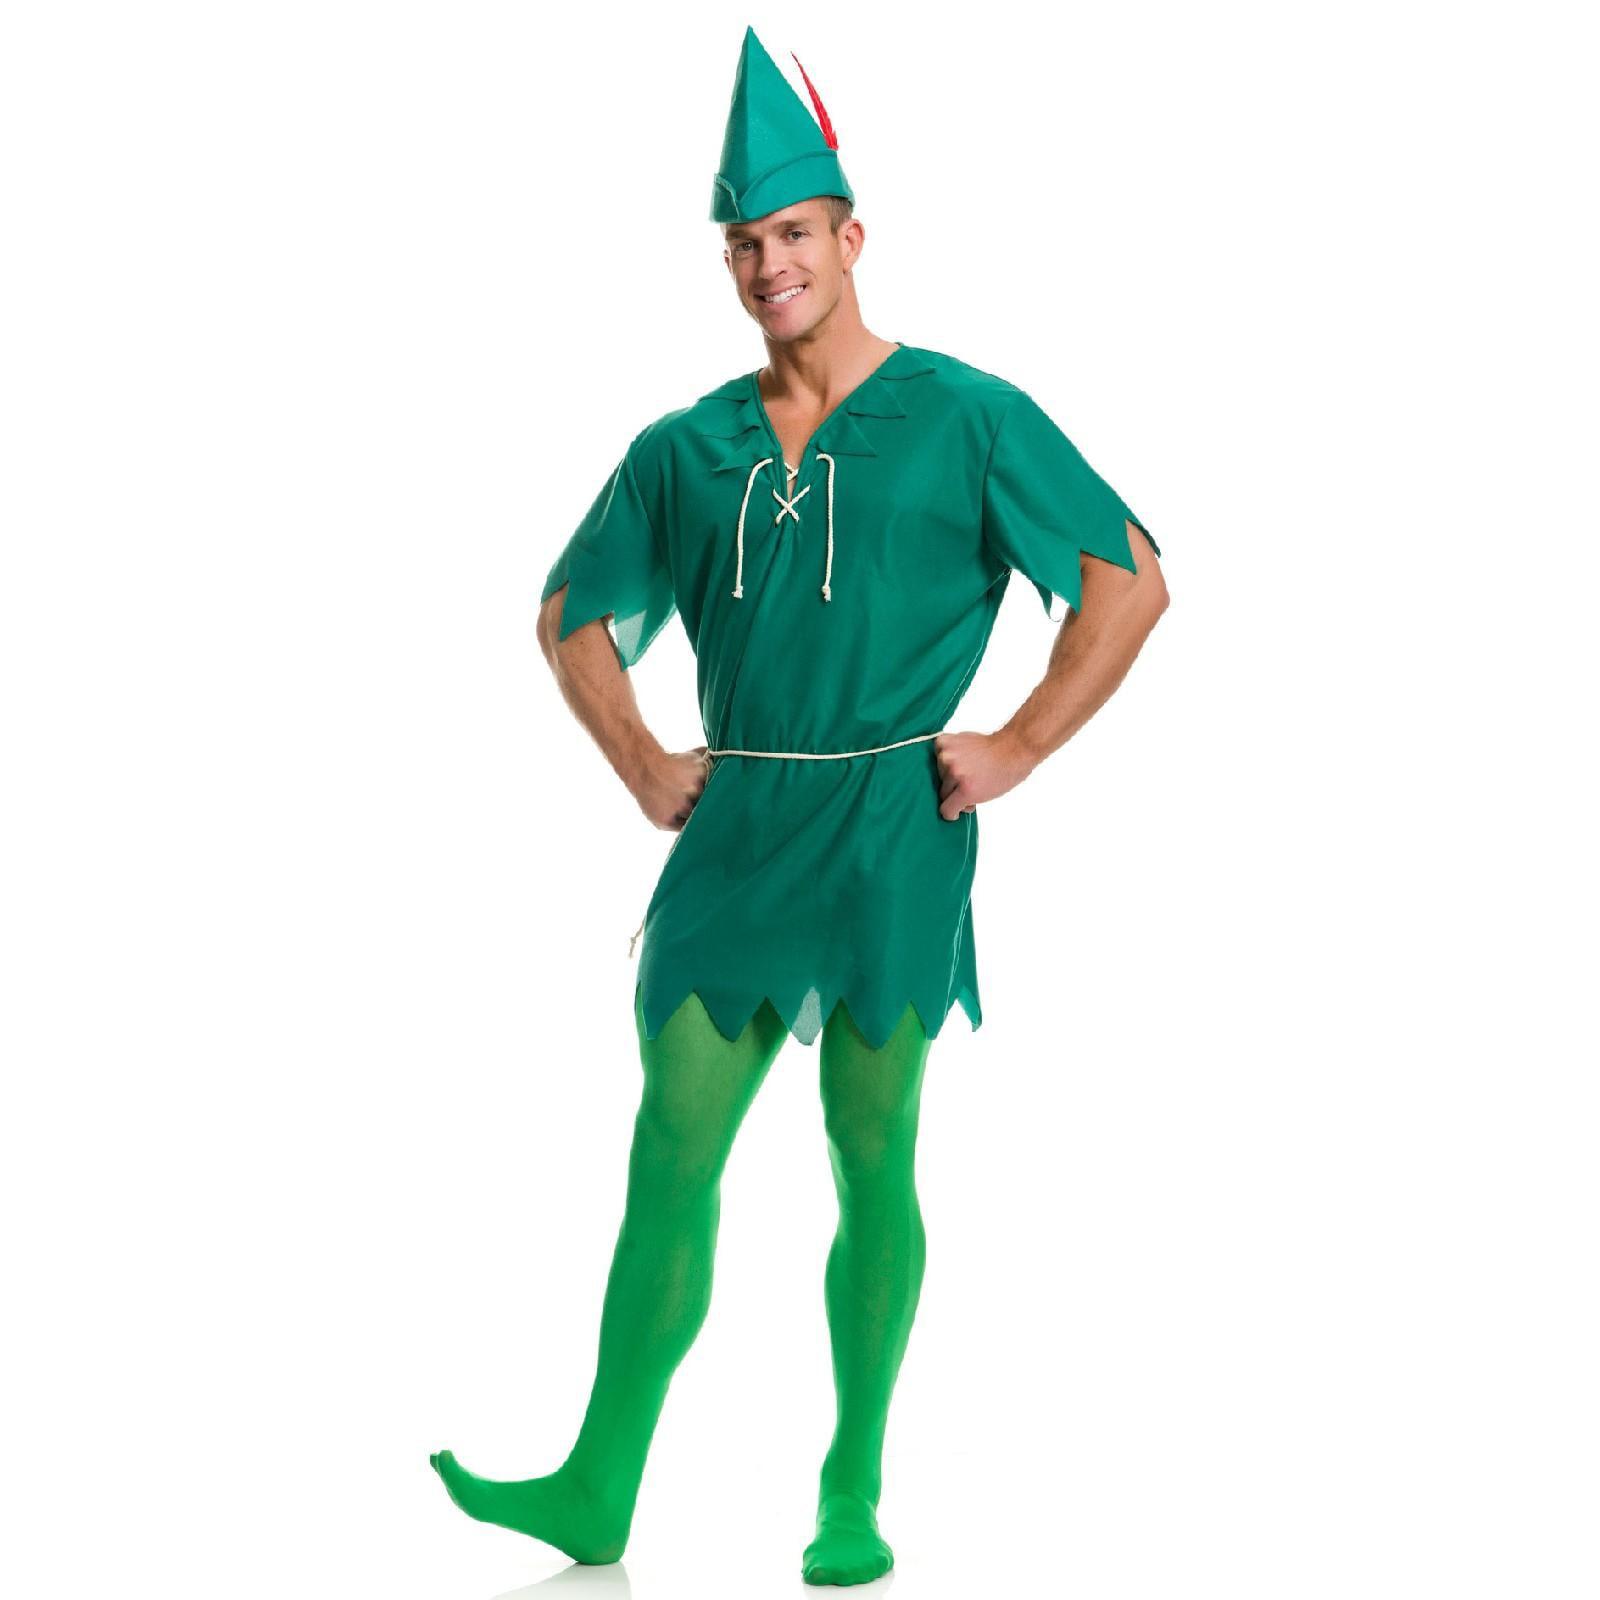 Quesera Unisex Peter Pan Costume Cosplay Peter Pan Tunic Adult Christmas Costume []